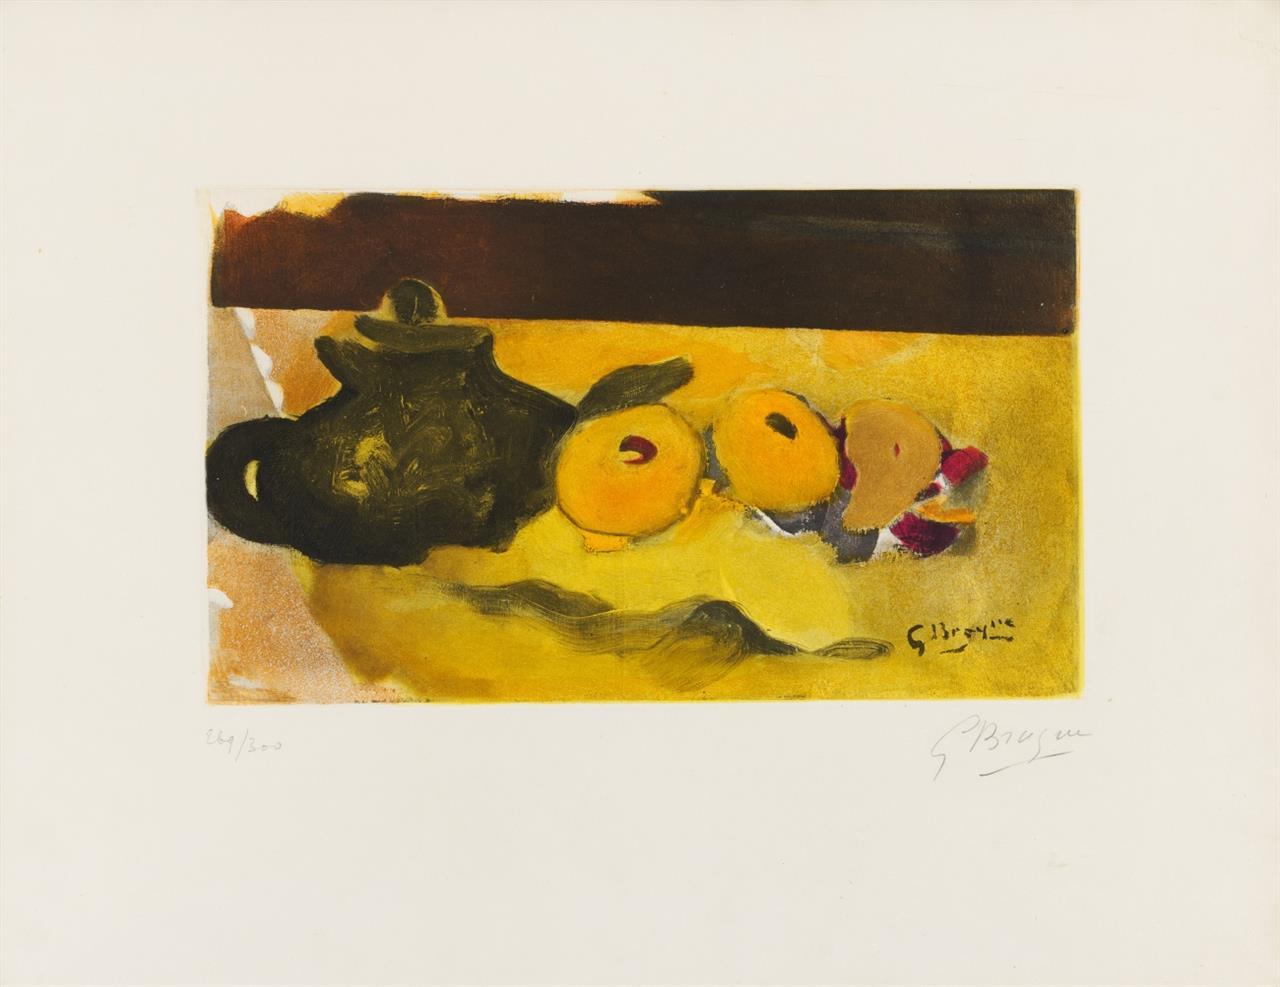 Georges Braque. La nappe jaune. Farbradierung. Signiert. Ex. 269/300. Vallier S. 295; Maeght 1038.